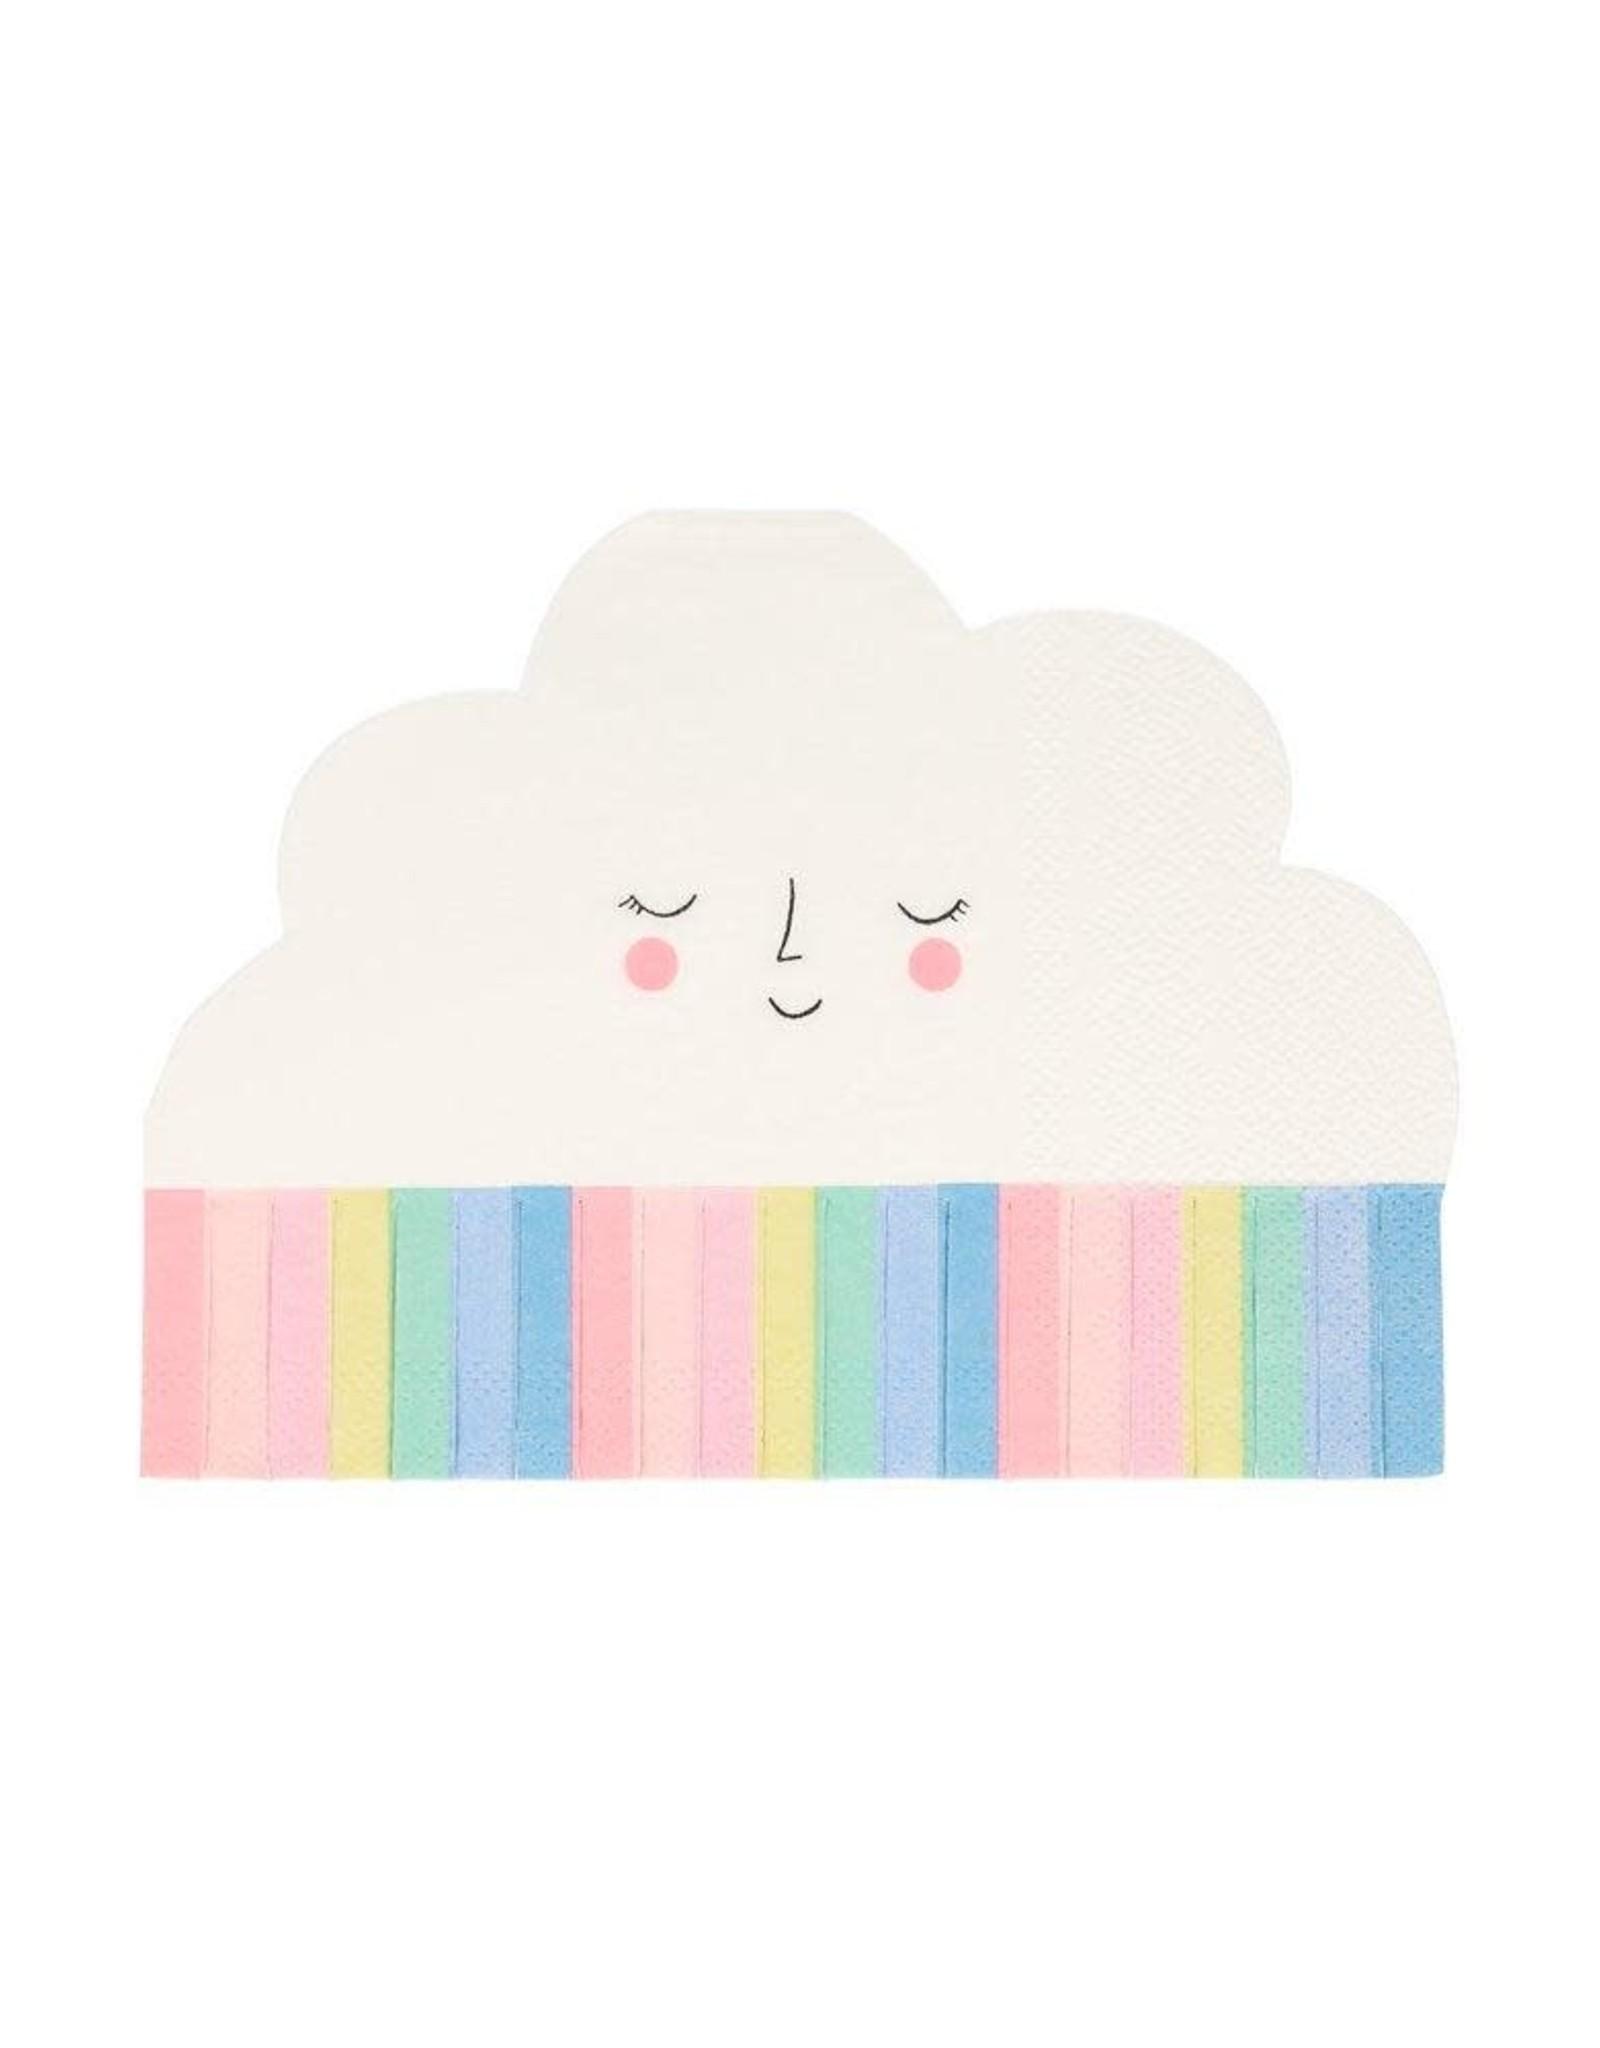 Meri Meri rainbow cloud napkin